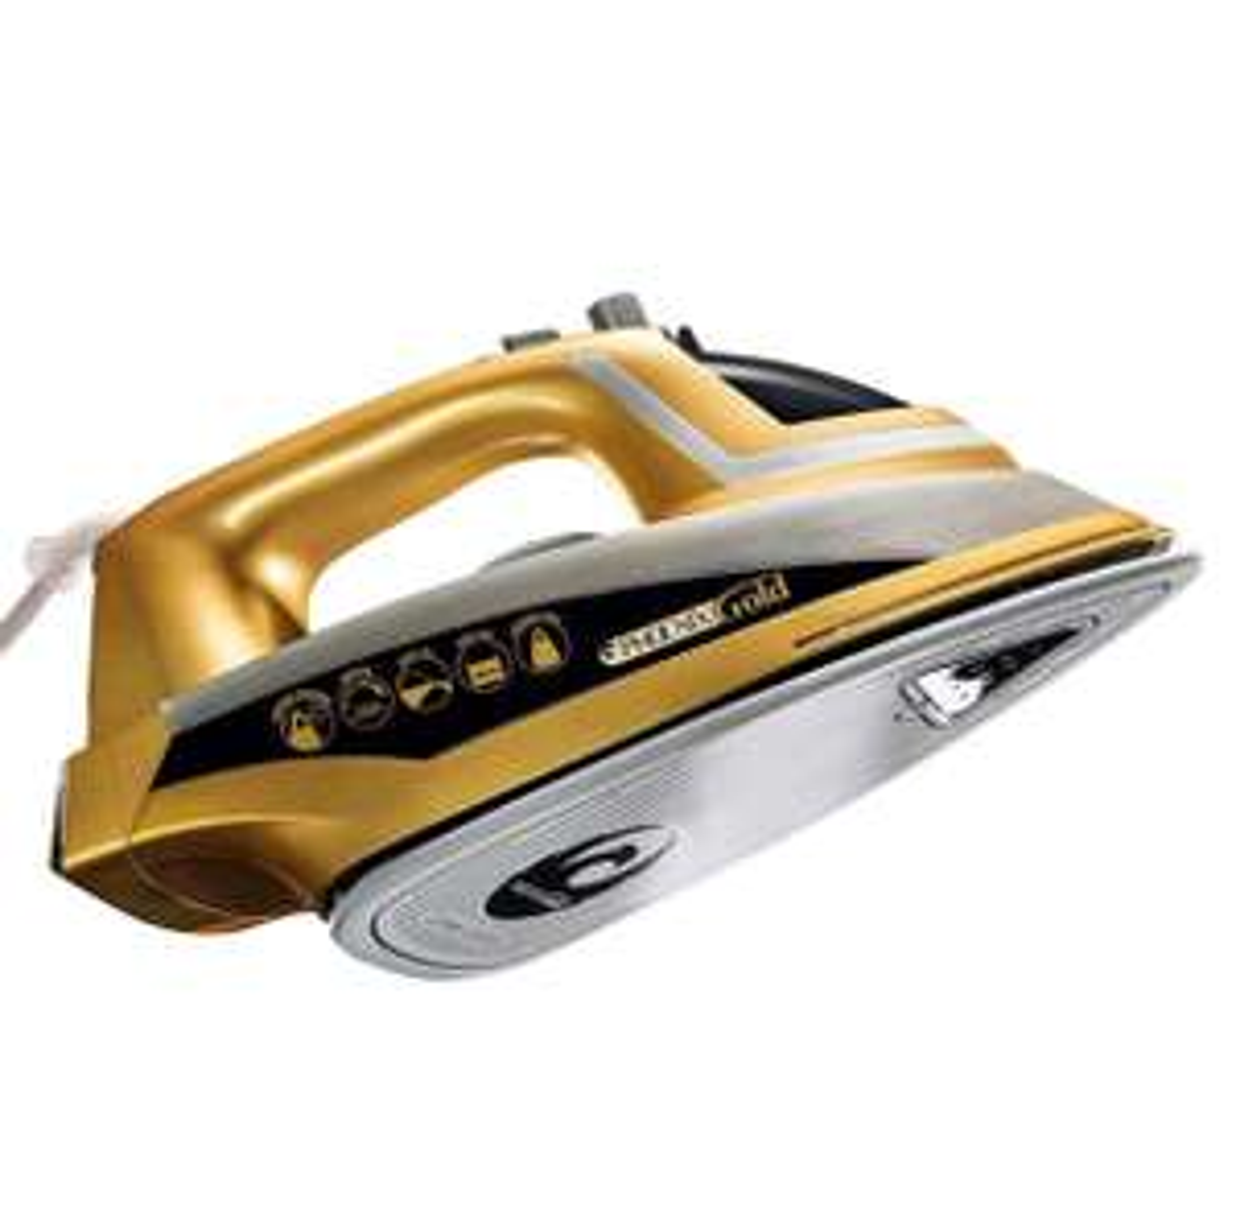 Phoenix Gold Iron @ JTF Online – £20